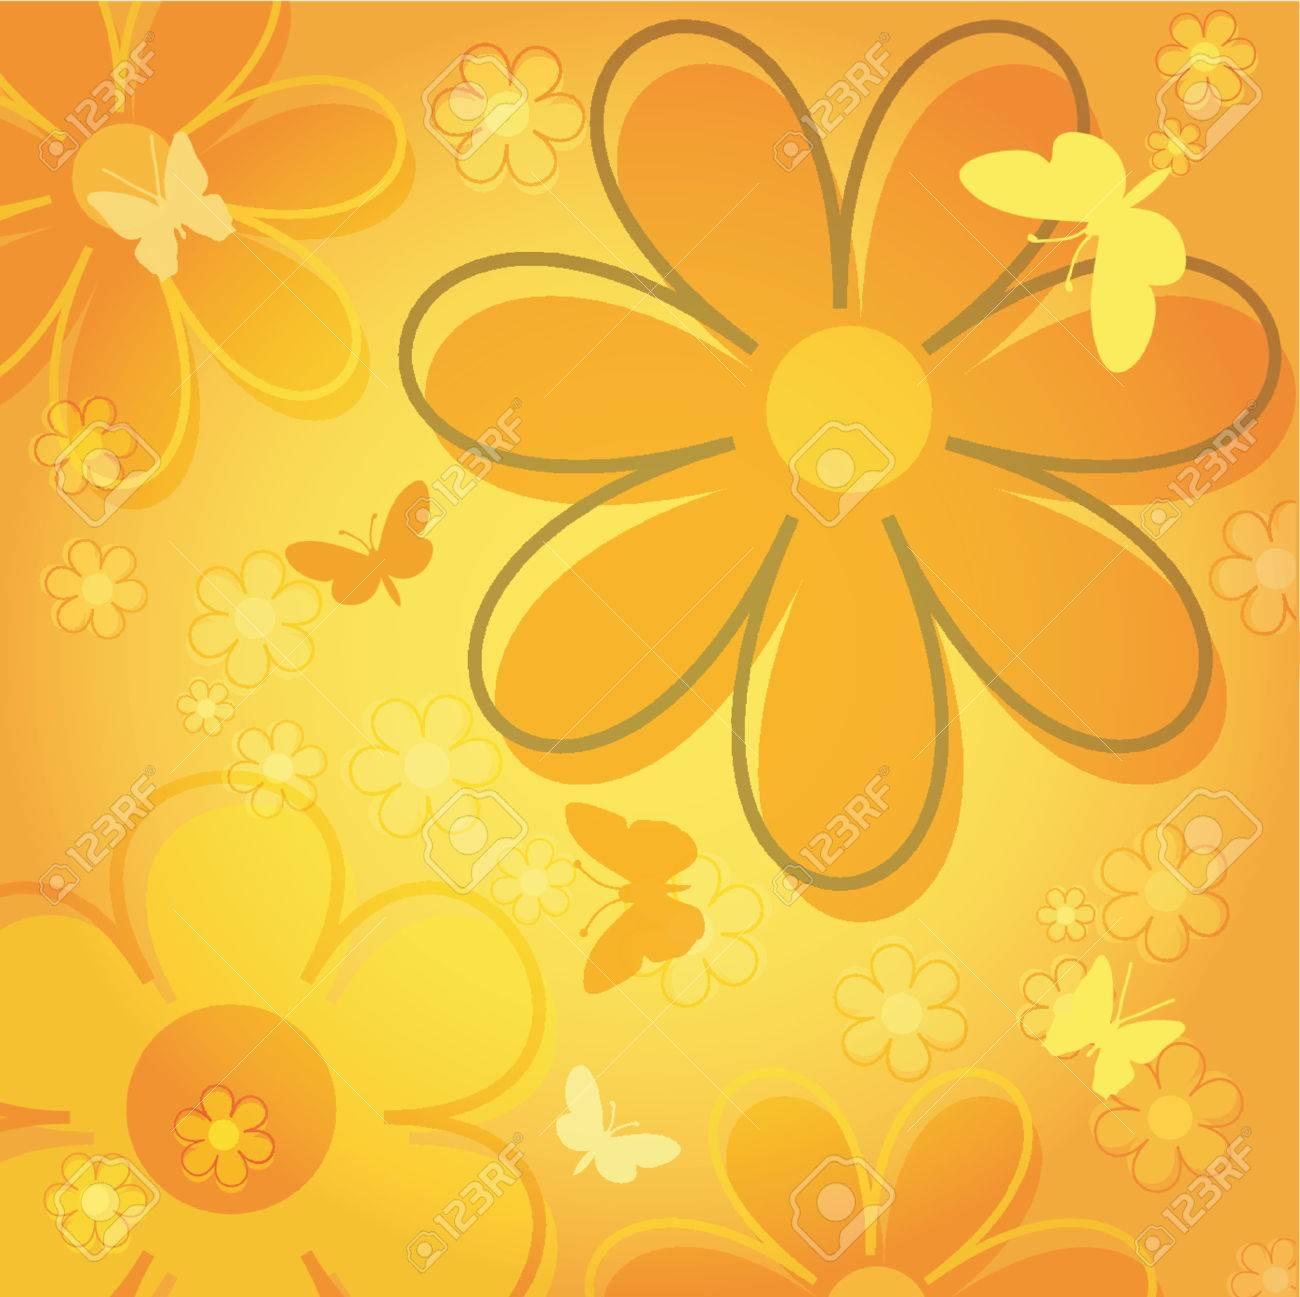 Flowers and butterflies - vector Stock Vector - 441418